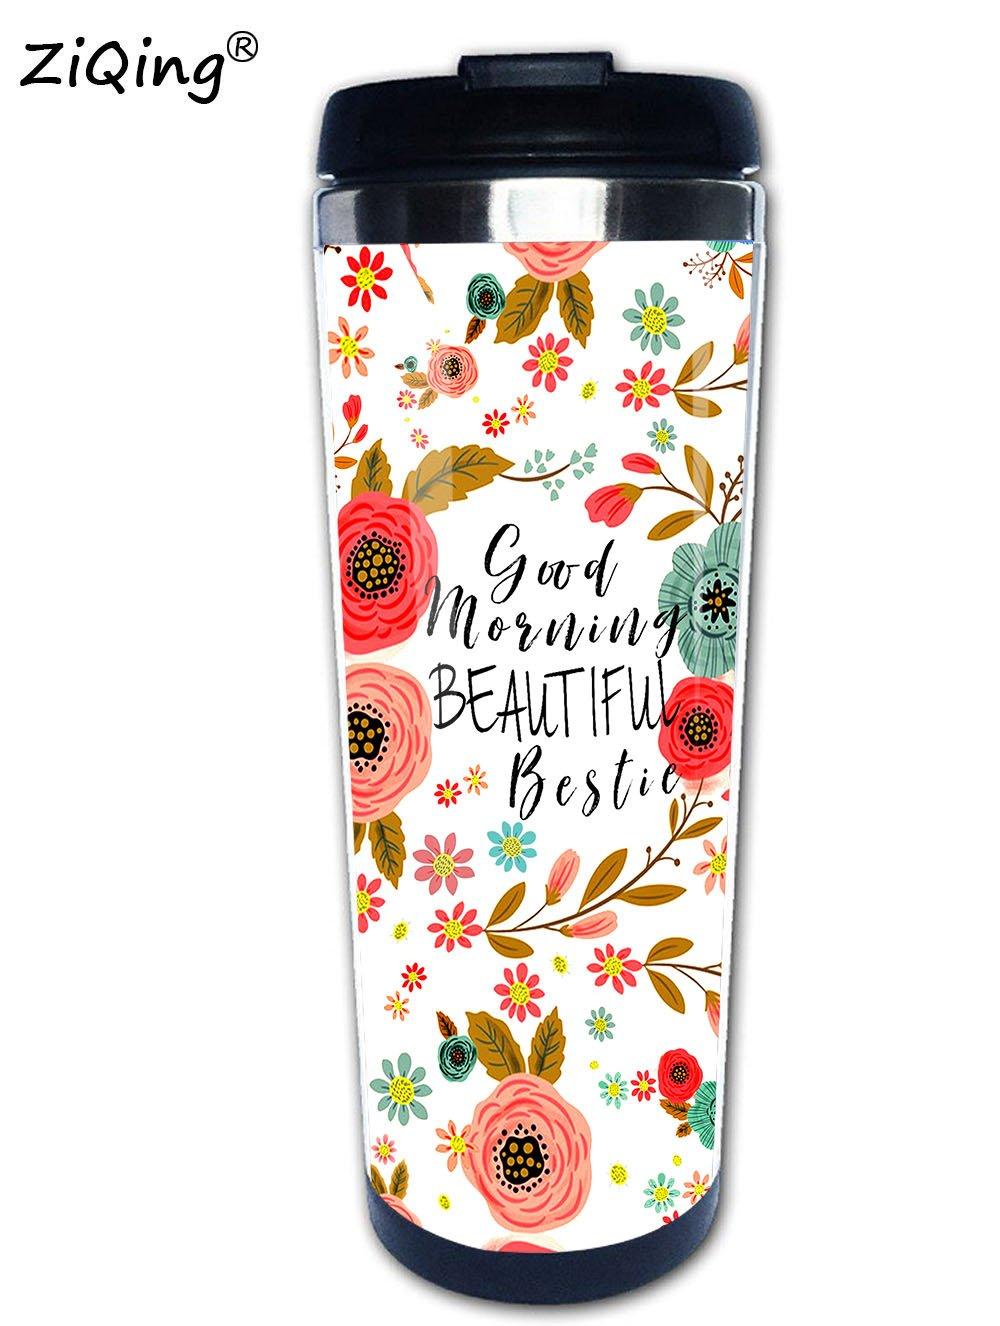 Best Friend Mug,Good Morning Beautiful Bestie Mug Flower Stainless Steel Travel Mug cup Tumbler 350ml Tea Mug Unique Novelty Gift Idea for Her, Best Friend Gift Idea